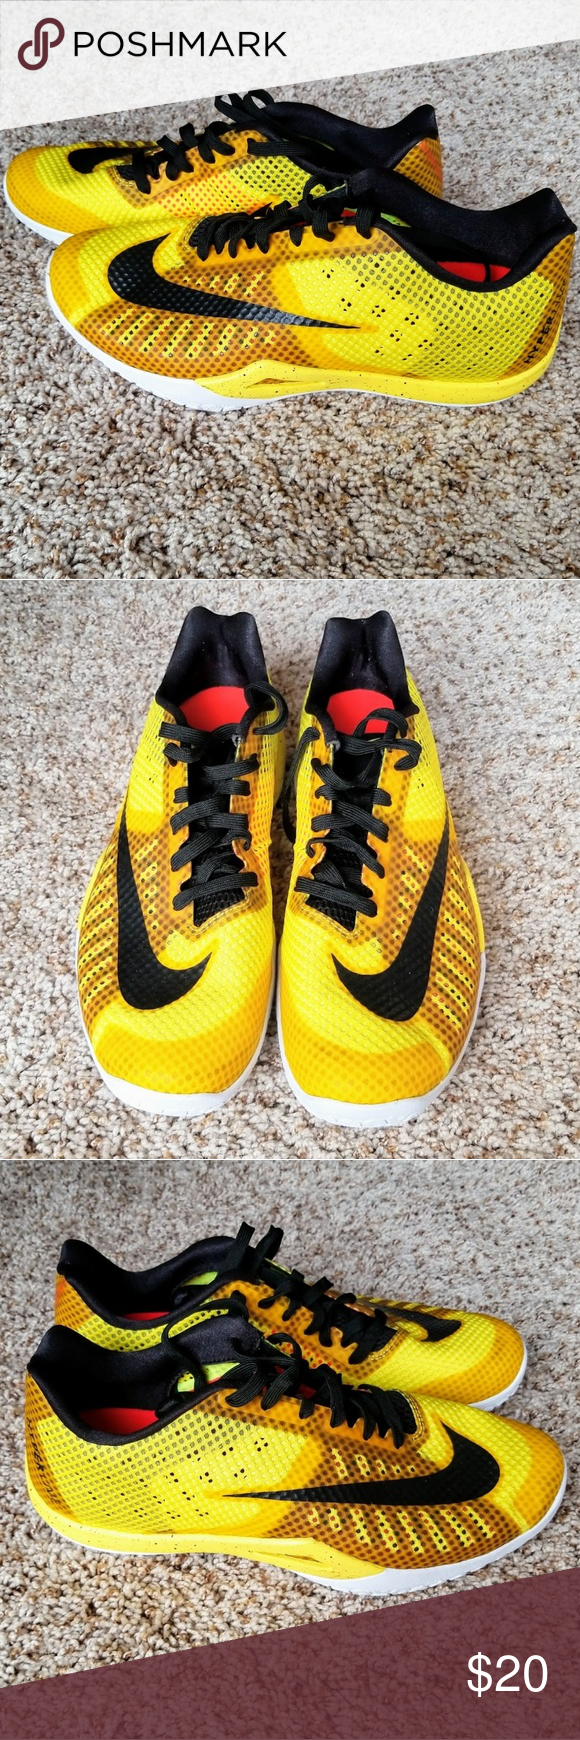 neon yellow nike tennis shoes cool basketball shoes